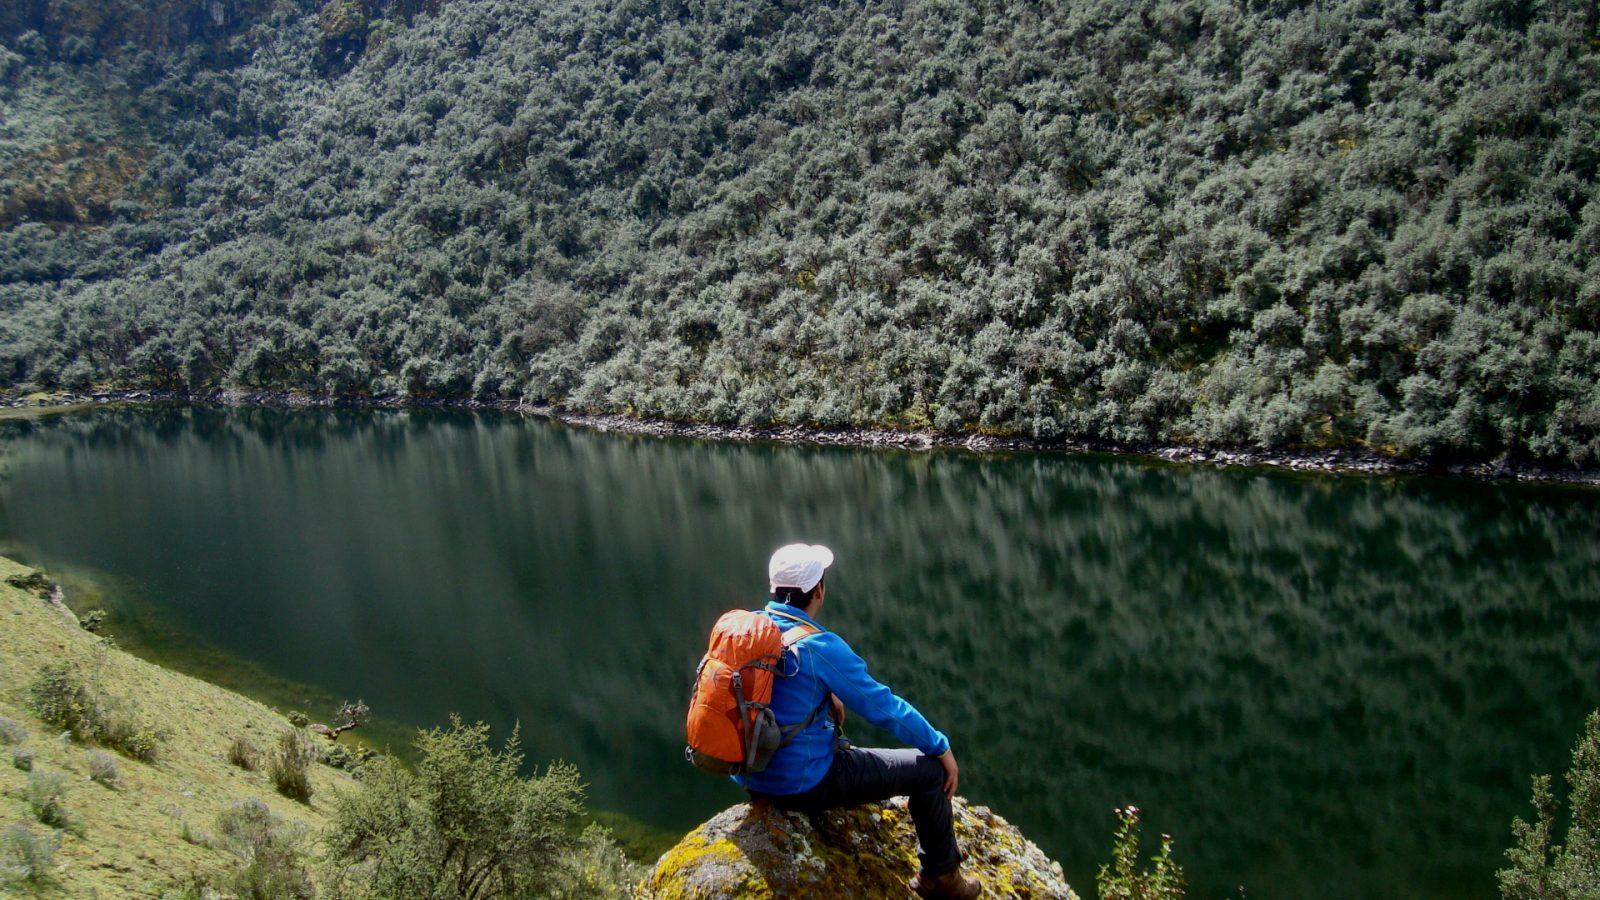 The Yanacocha lake trekking by inka trail trek